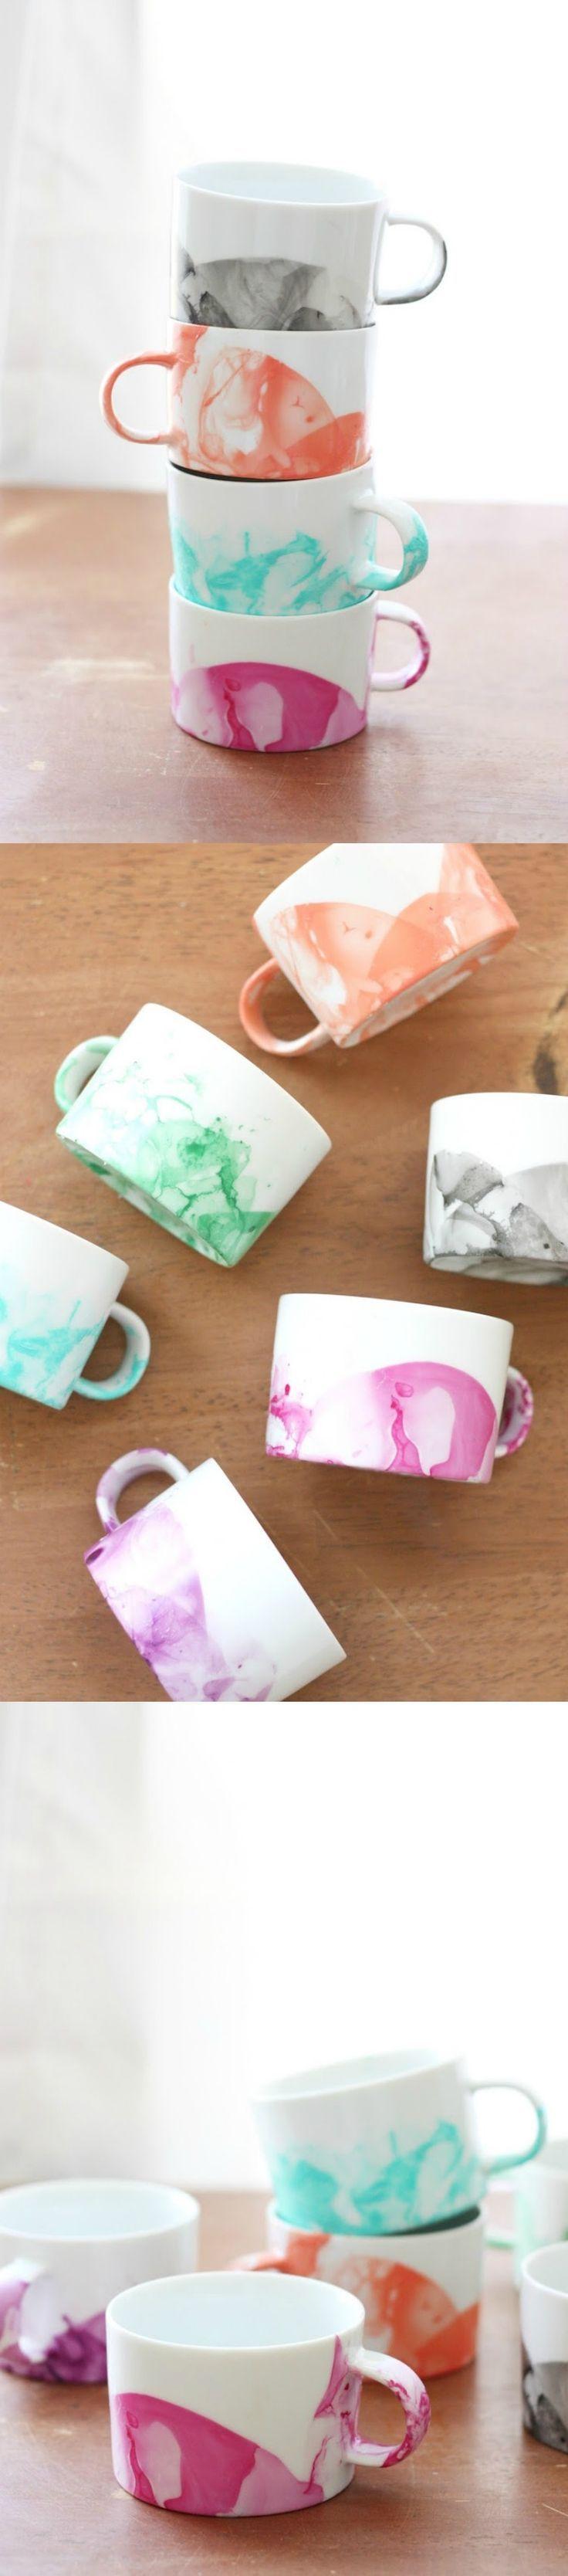 DIY Marbled Mugs with Nail Polish | Marmorieren, Nagellack und Porzellan